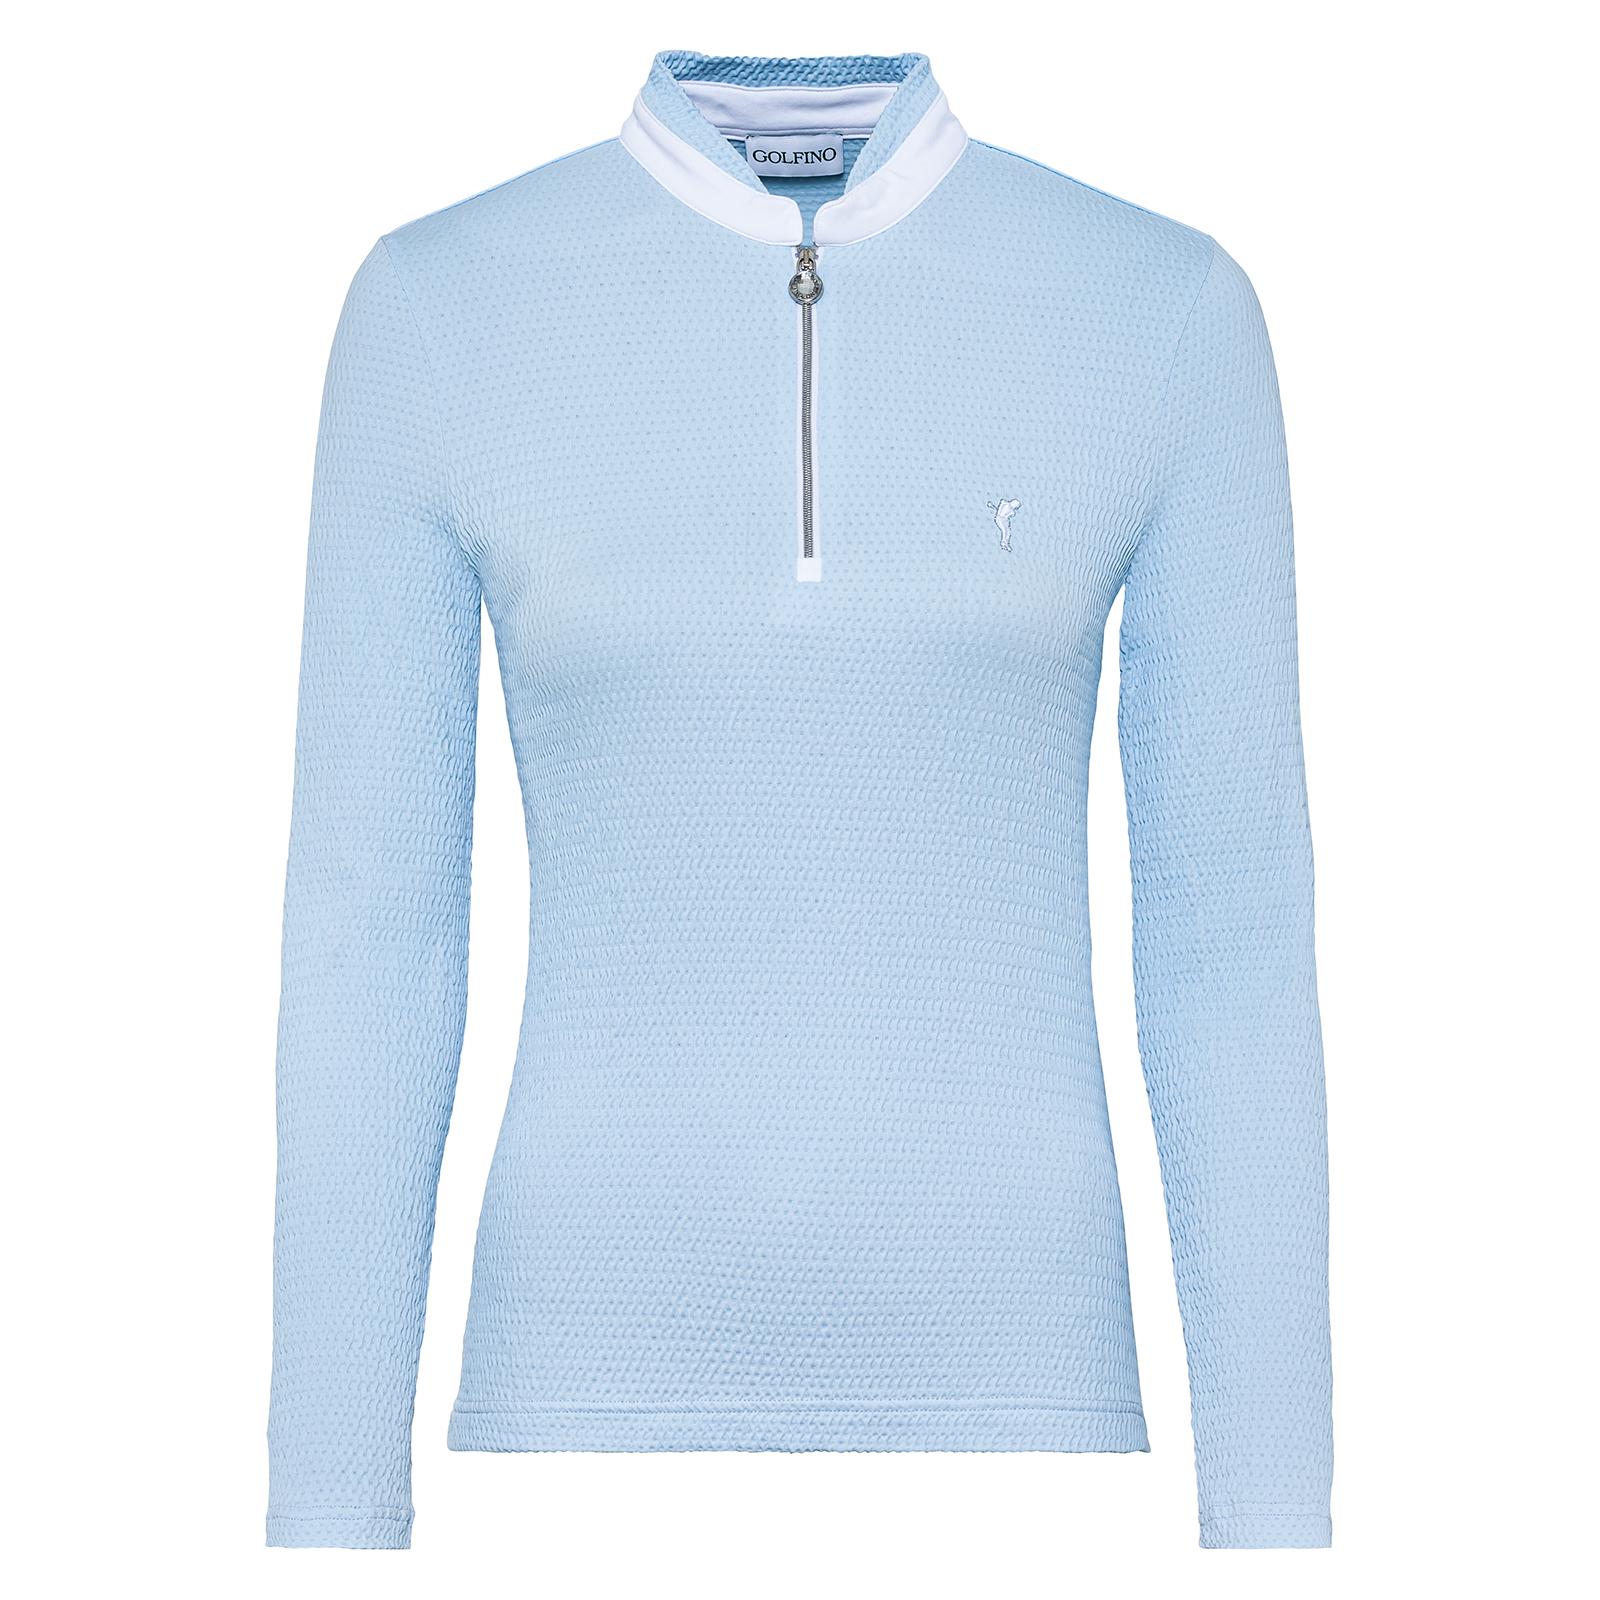 Leichter Damen Golf Pullover